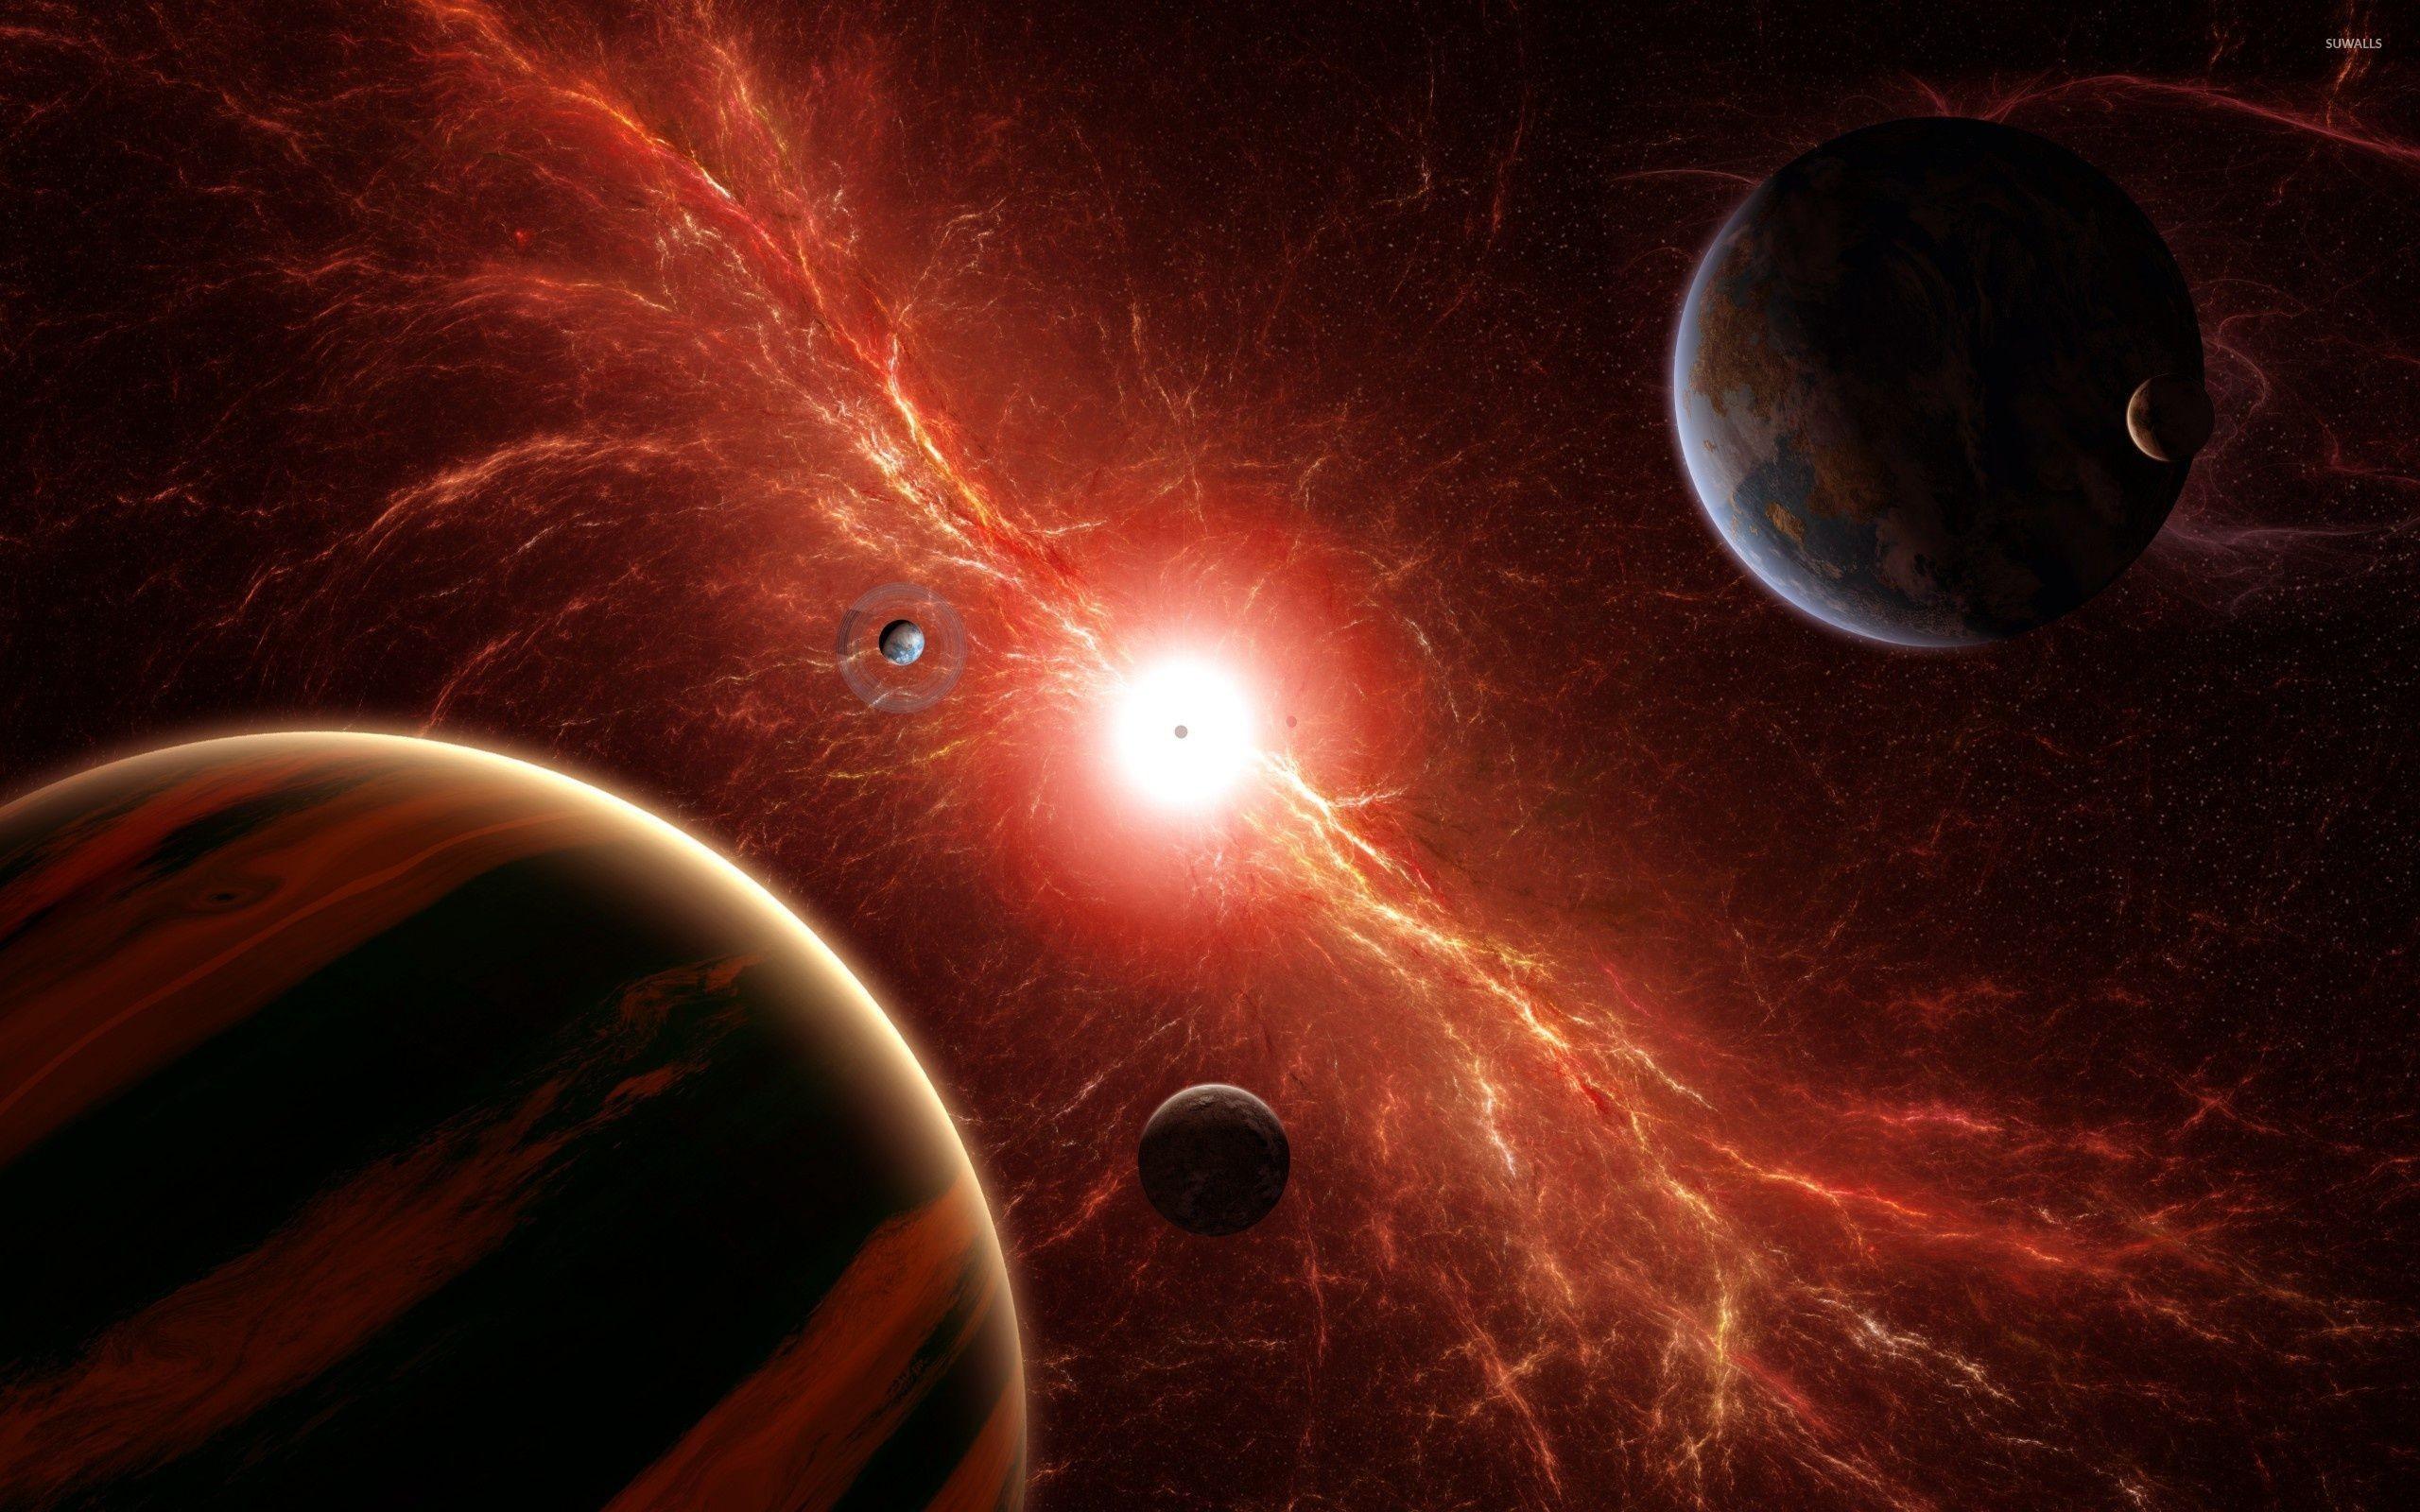 Red supernova wallpaper